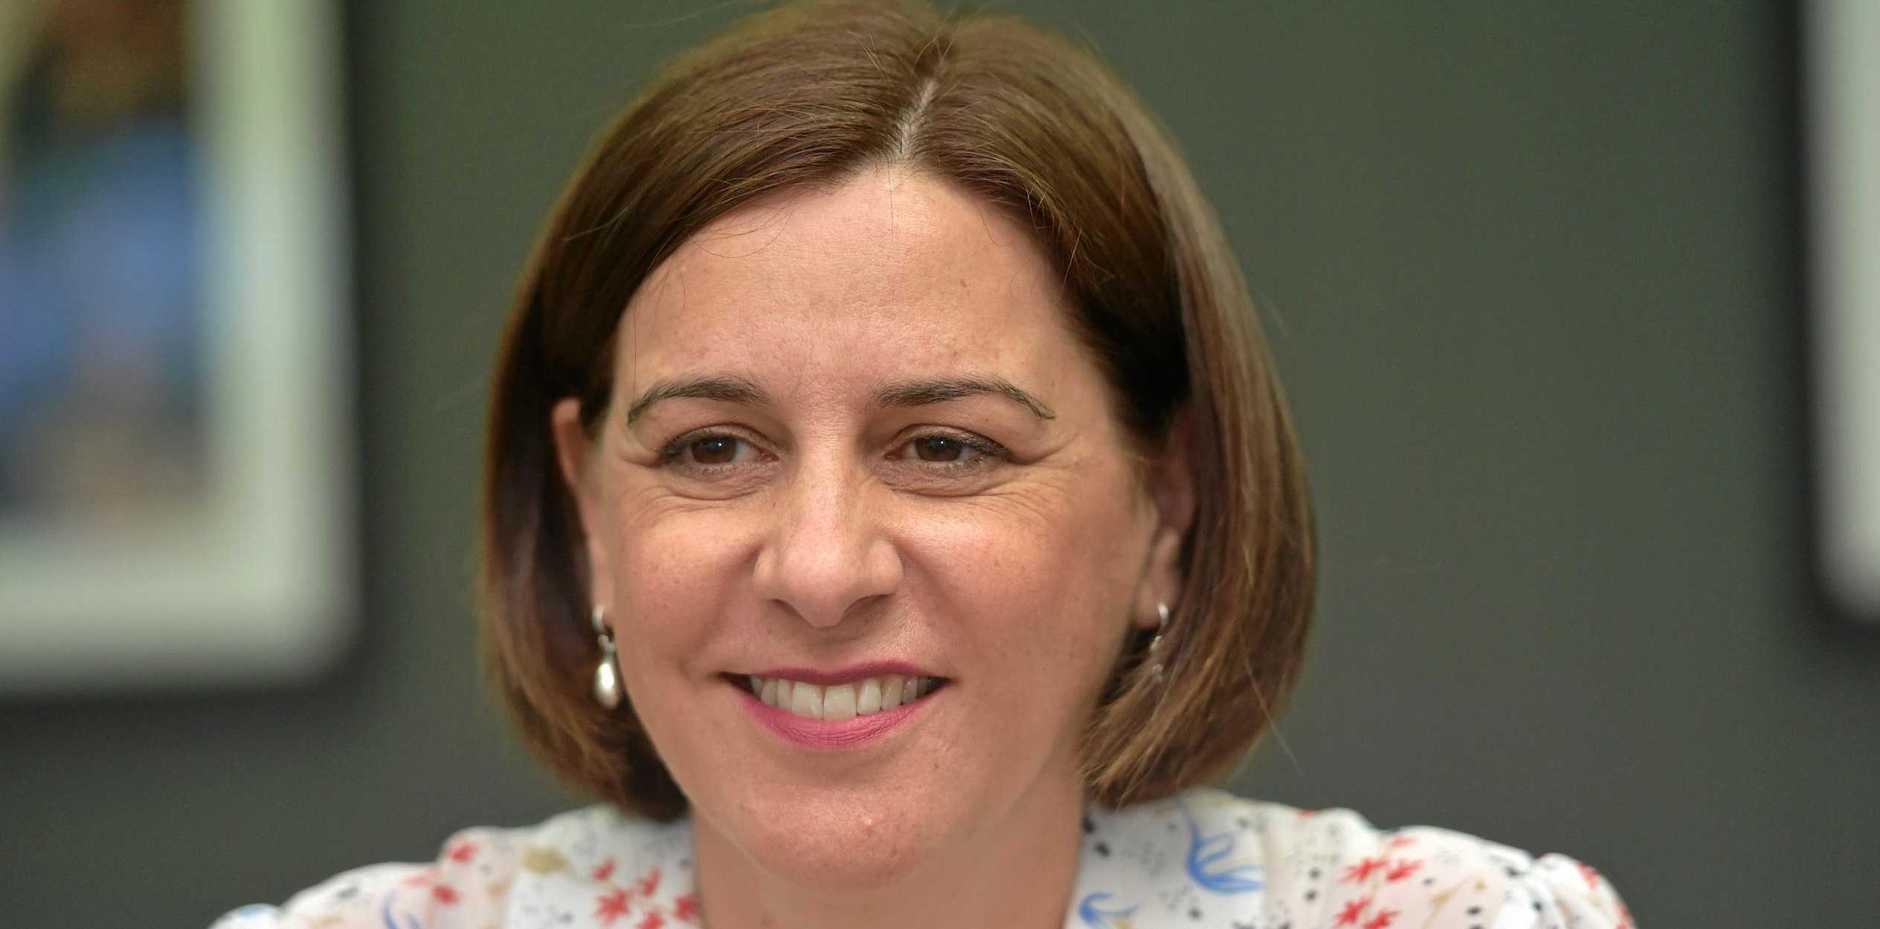 Queensland LNP Leader Deb Frecklington has praised the career of retiring Member for Caloundra Mark McArdle.